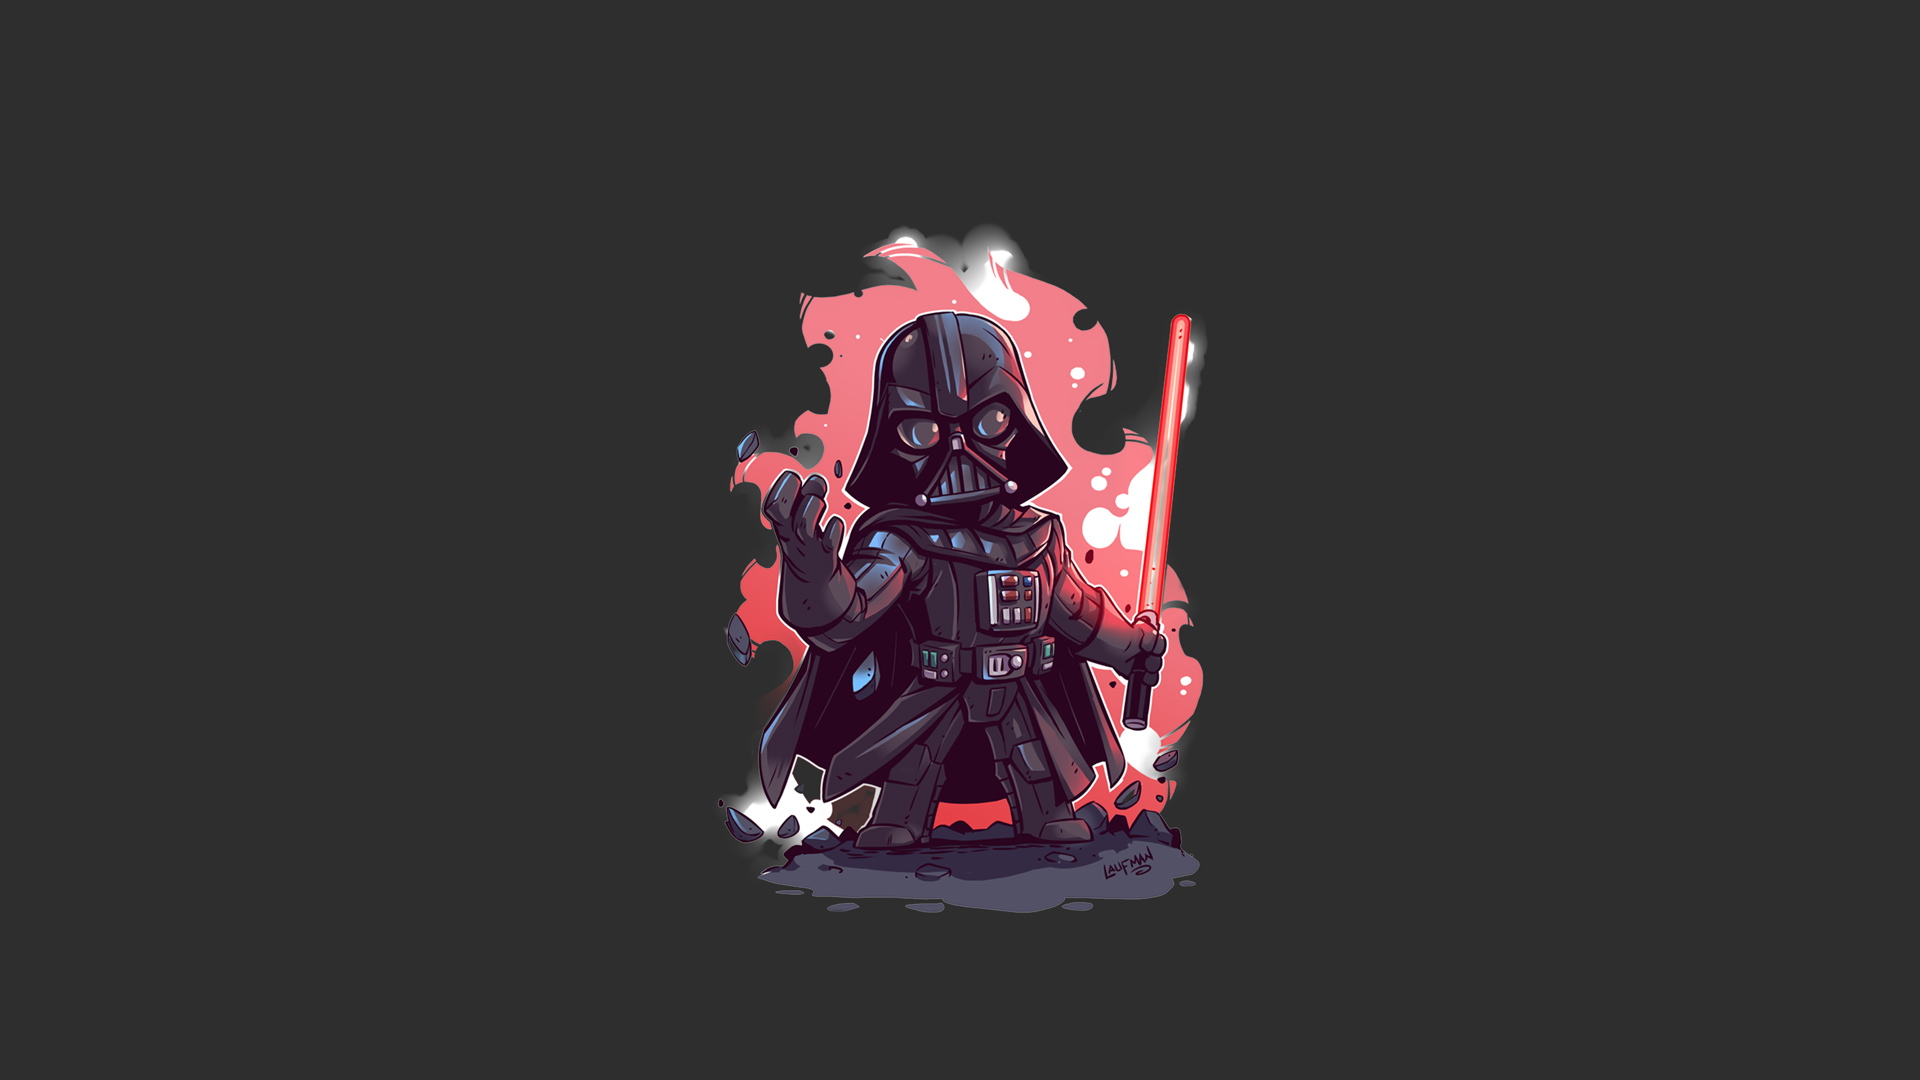 750x1334 Darth Vader Minimal Art Iphone 6 Iphone 6s Iphone